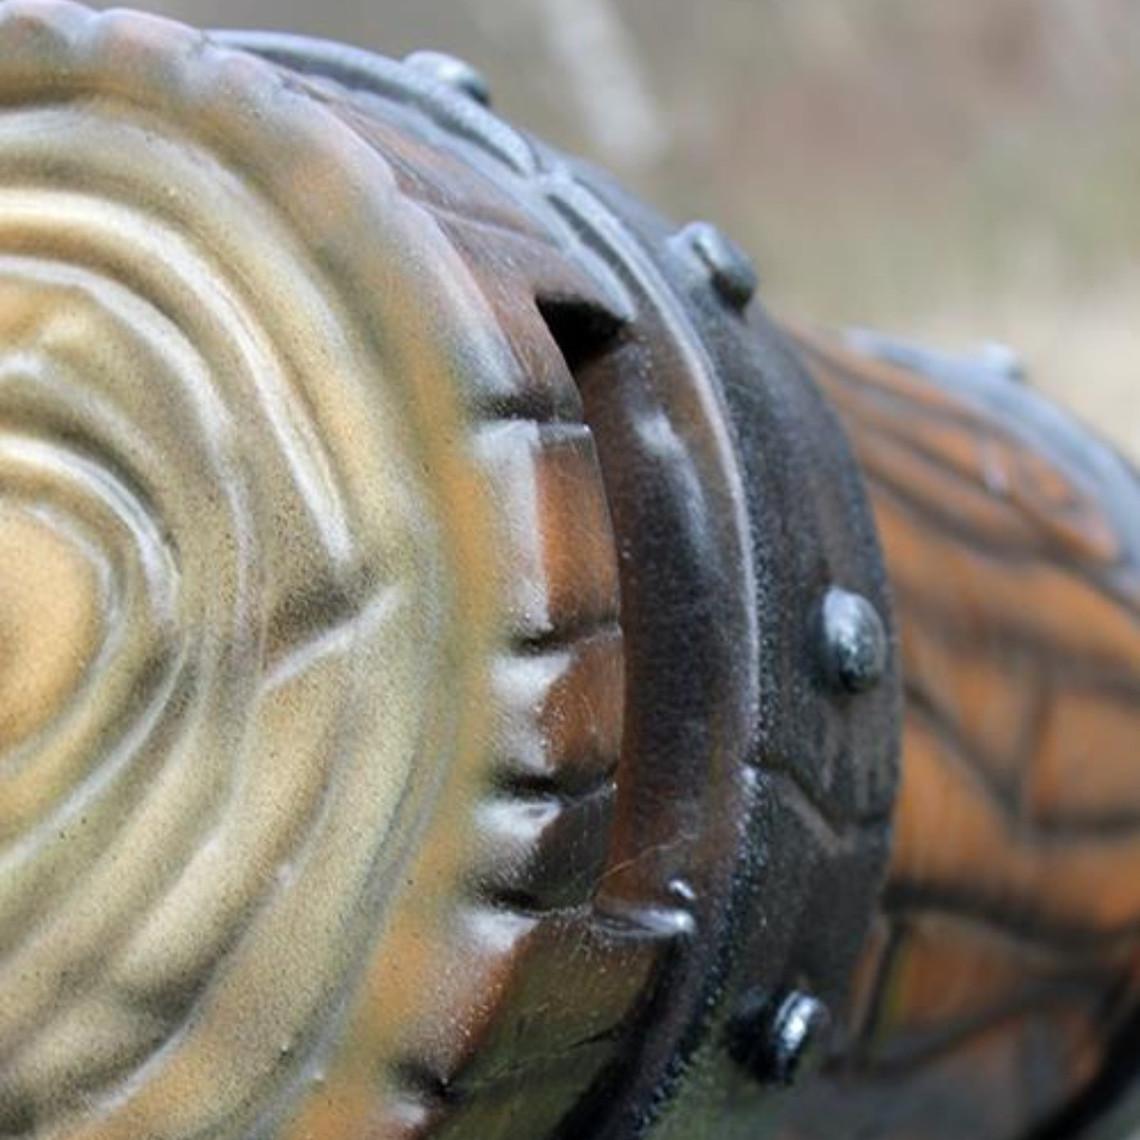 Epic Armoury LARP houten strijdhamer